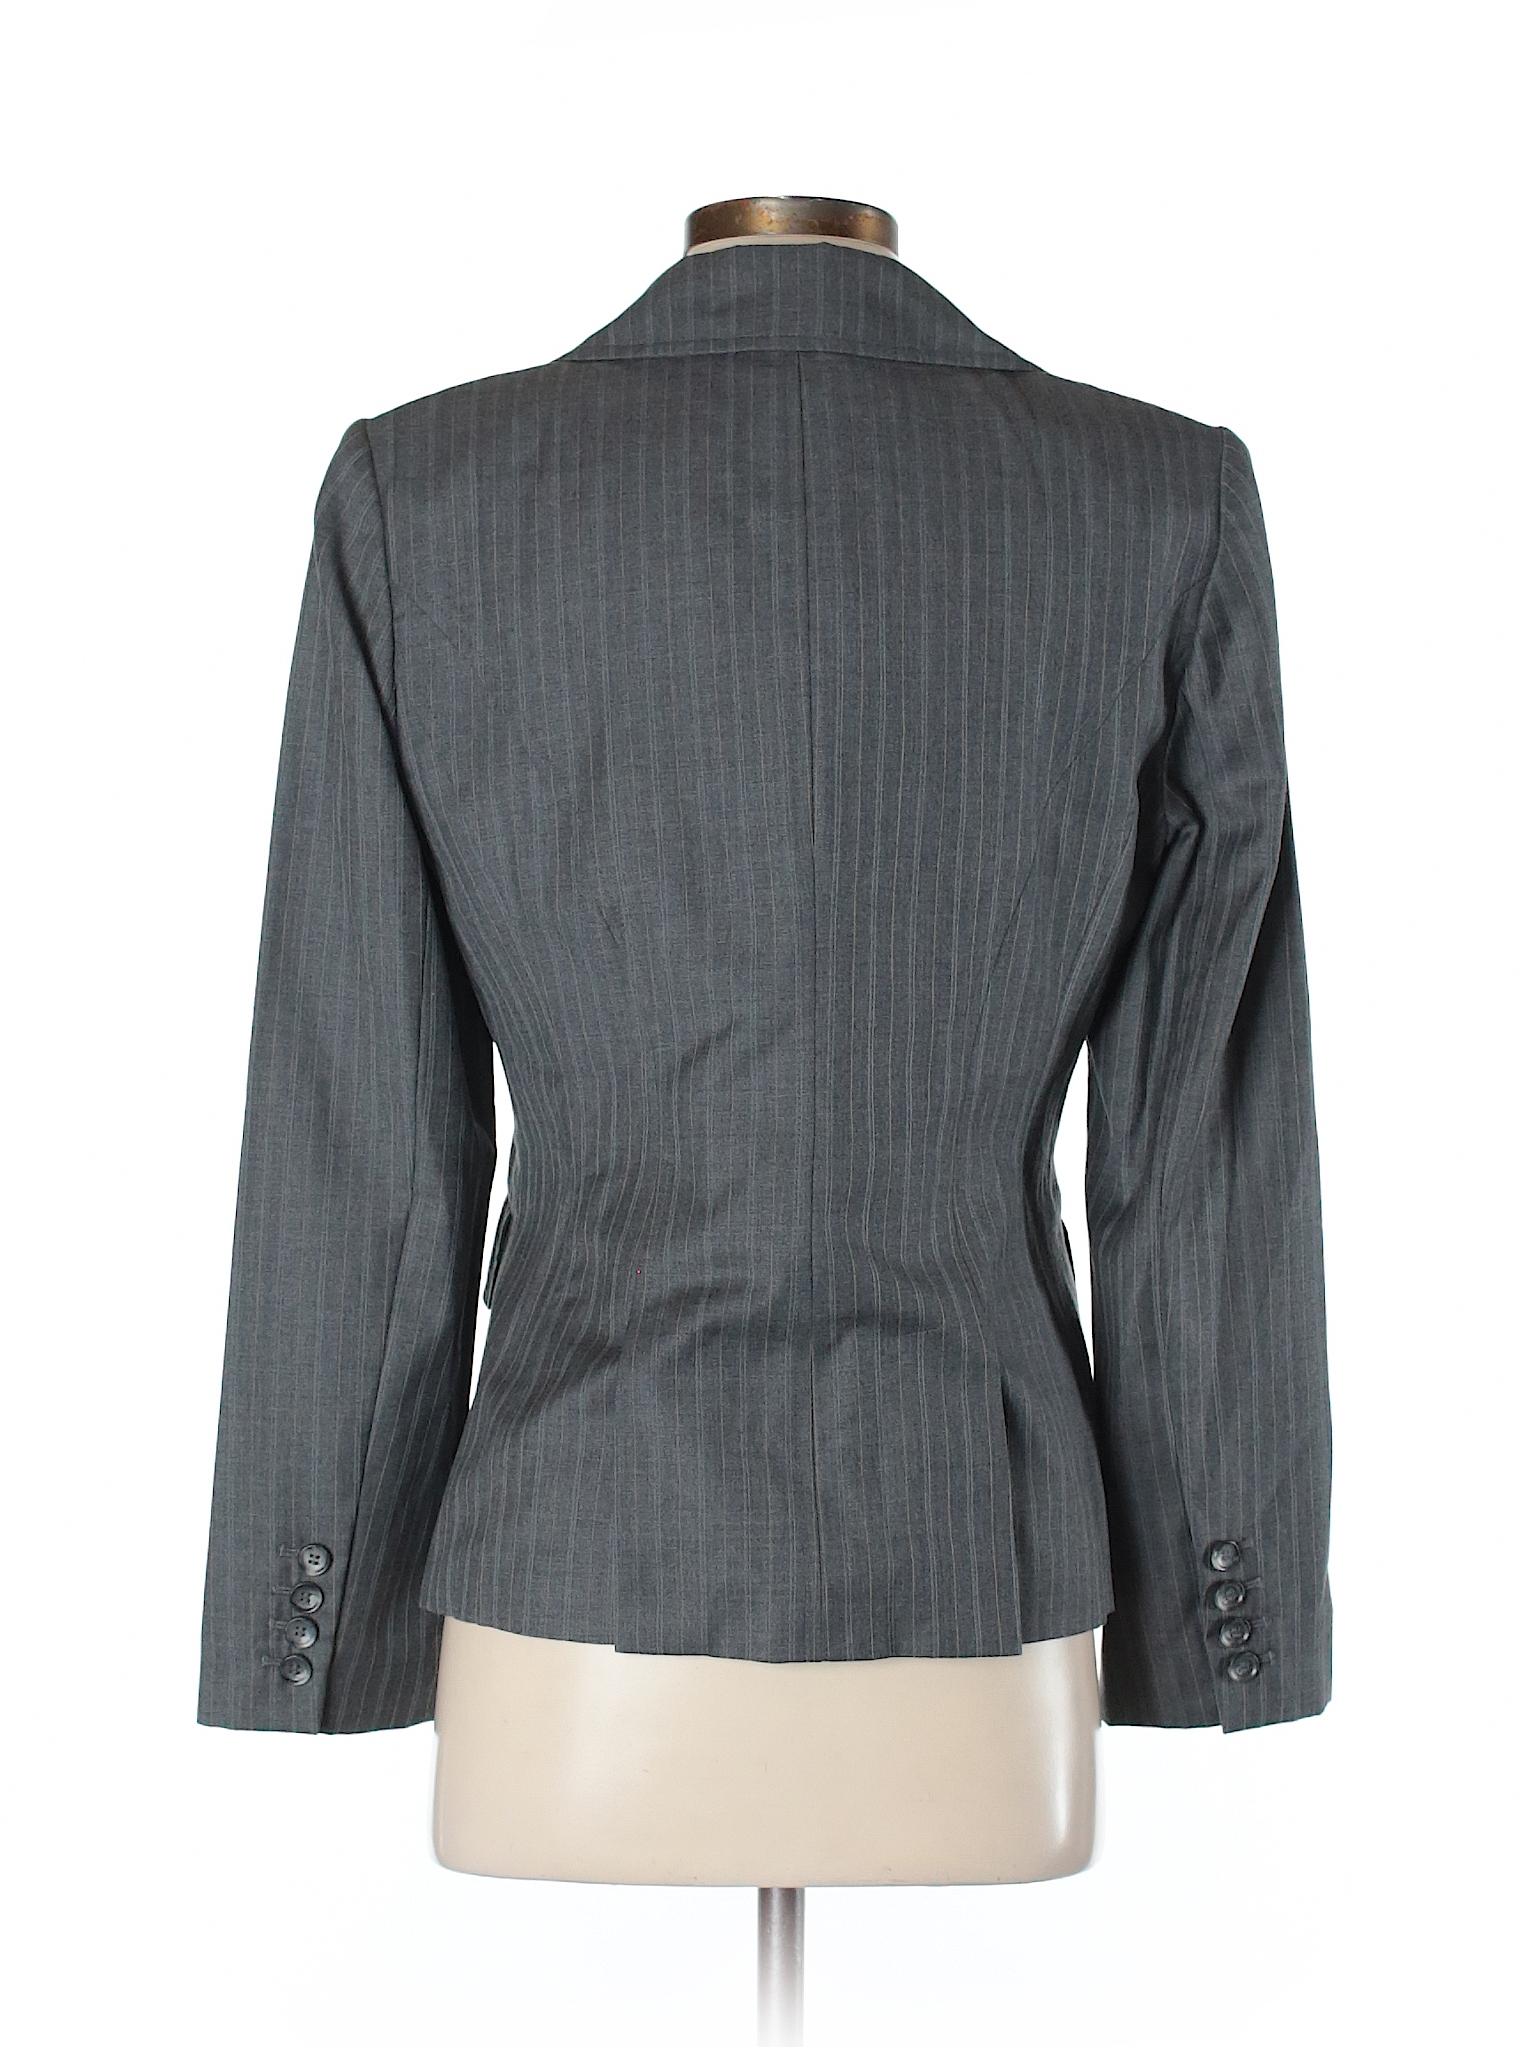 Blazer winter Wool Ann Boutique Taylor q1UafZwx7